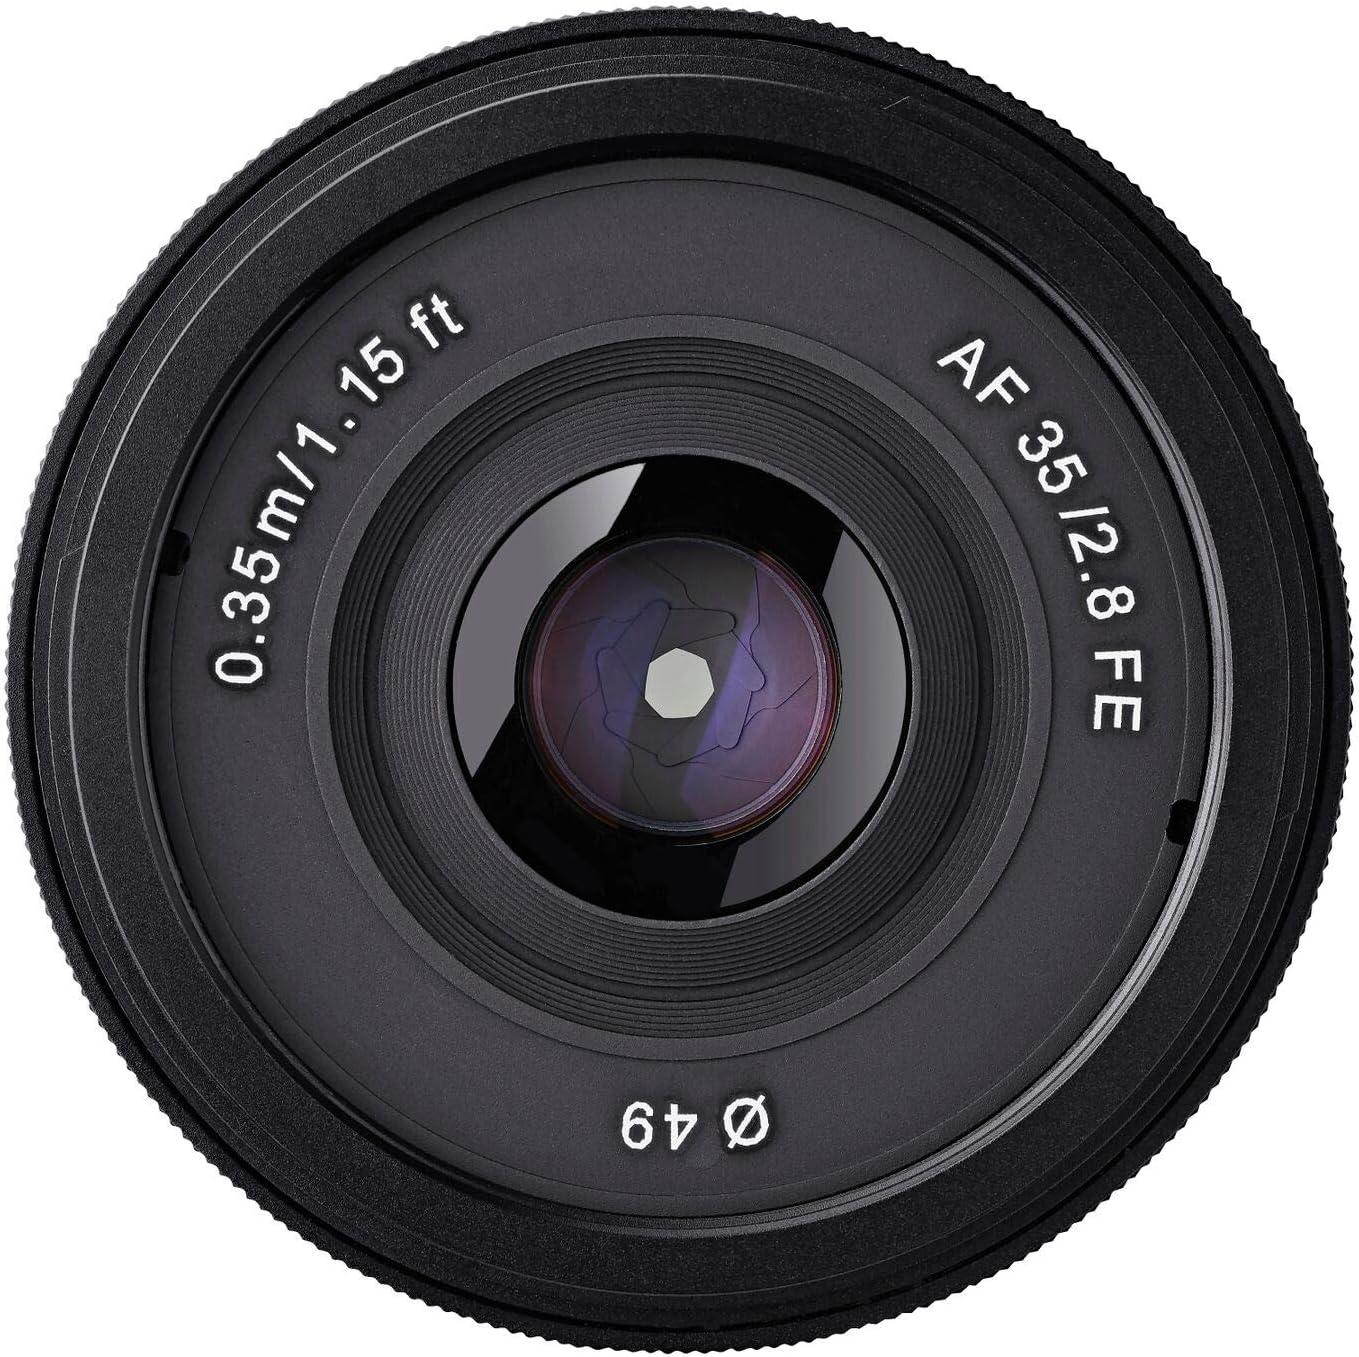 Samyang Syio35af E 35 Mm F 2 8 Ultra Compact Wide Angle Camera Photo